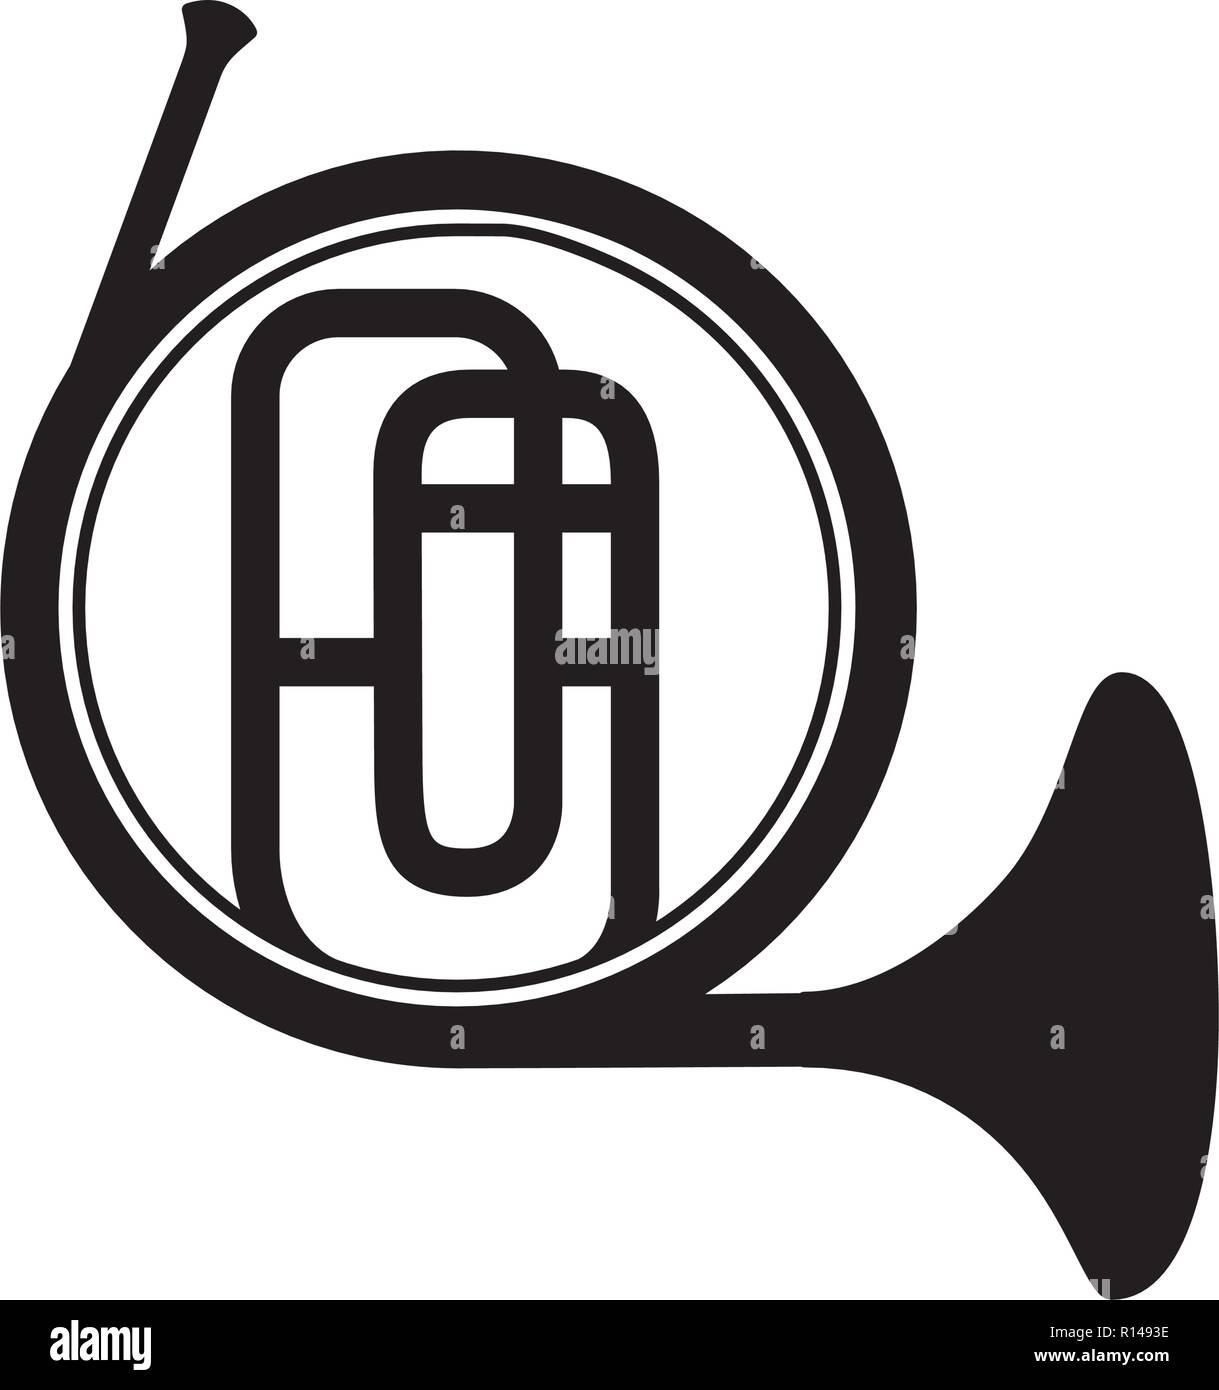 french horn instrument on white background vector illustration - Stock Image